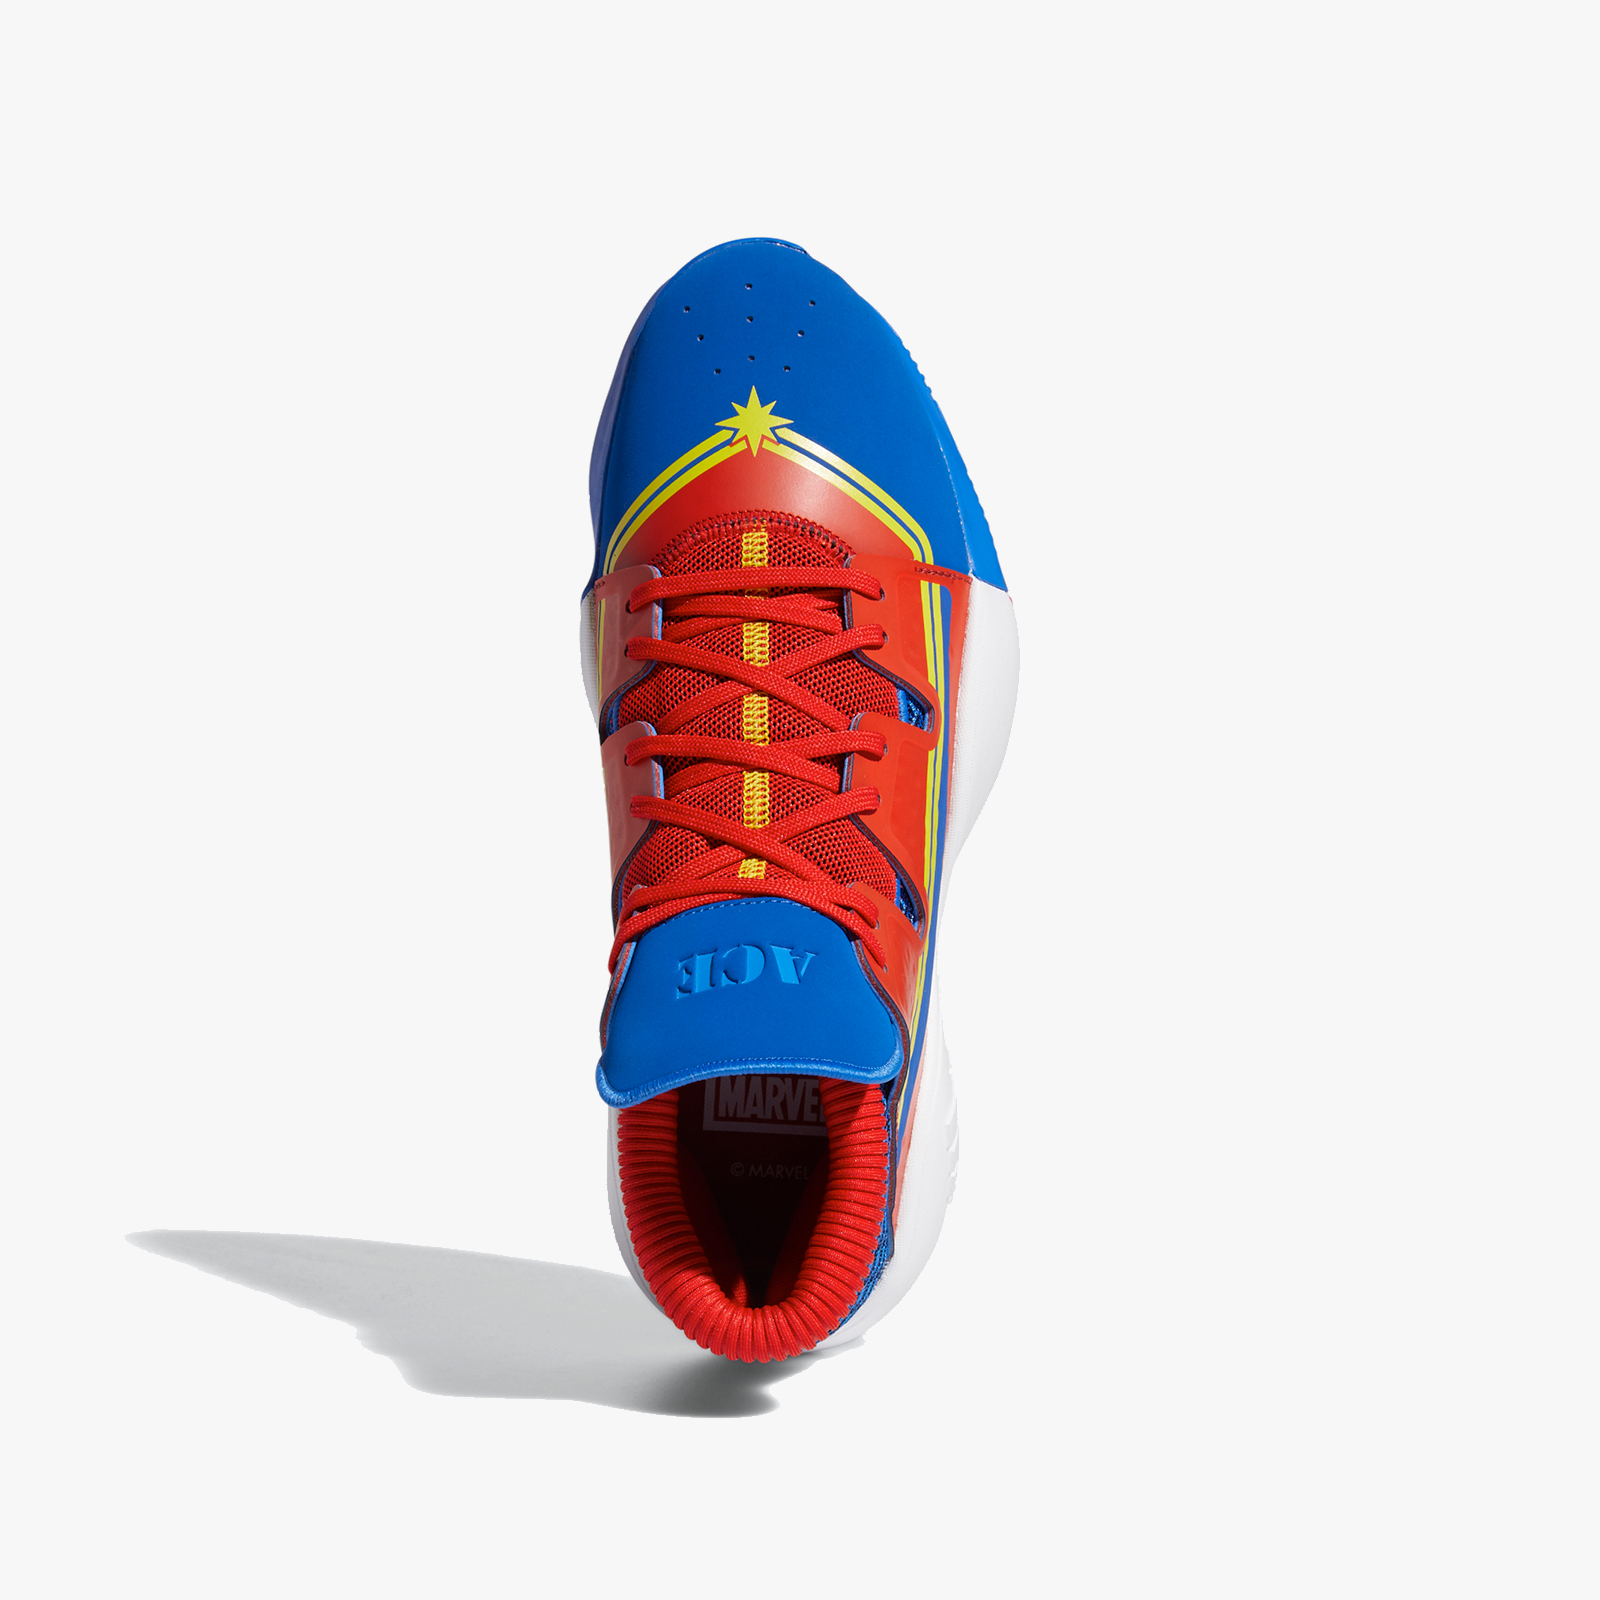 adidas Pro Vision x Captain Marvel Ef2260 Sneakersnstuff